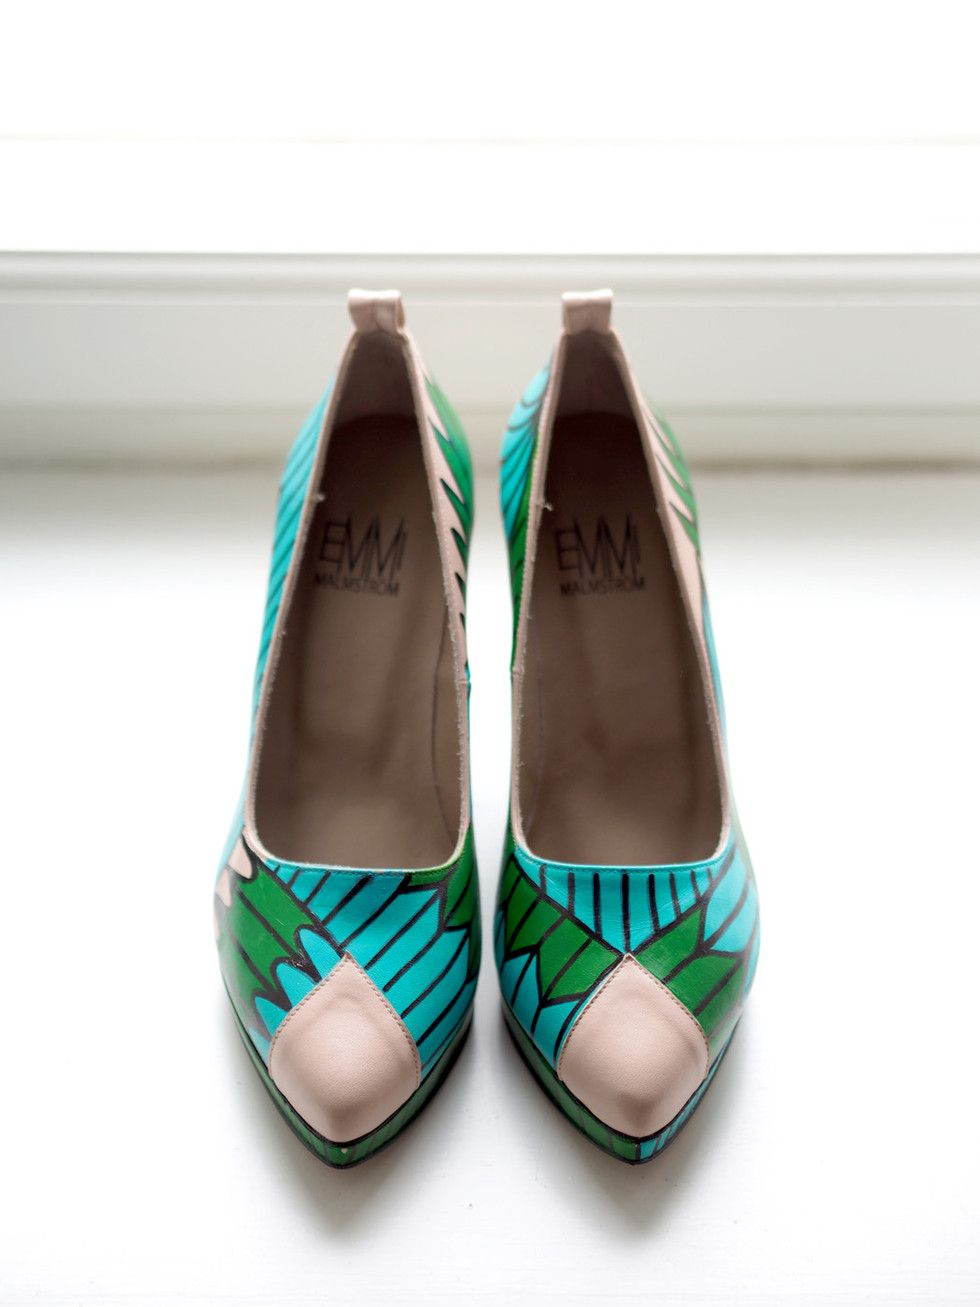 Amazing hand painted shoes by Emmi Malmström | Photo: Pupulandia